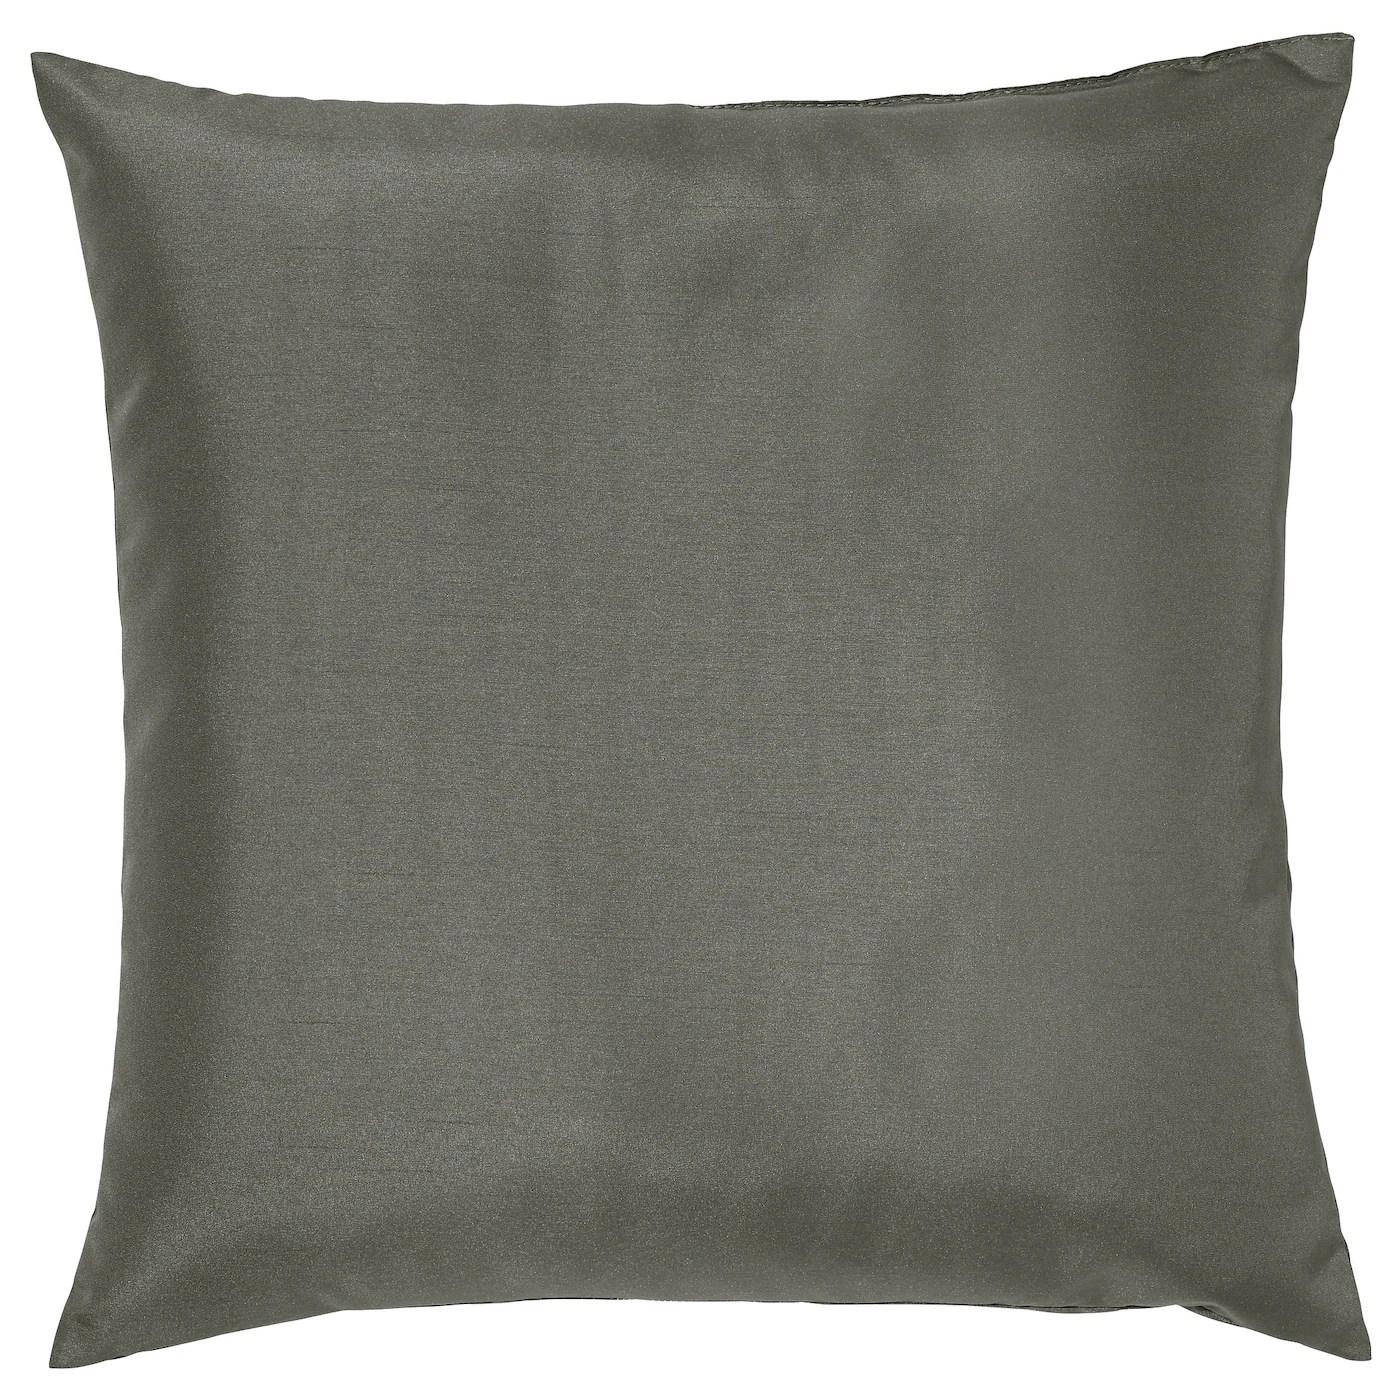 Cushions  Cushion Pads  IKEA